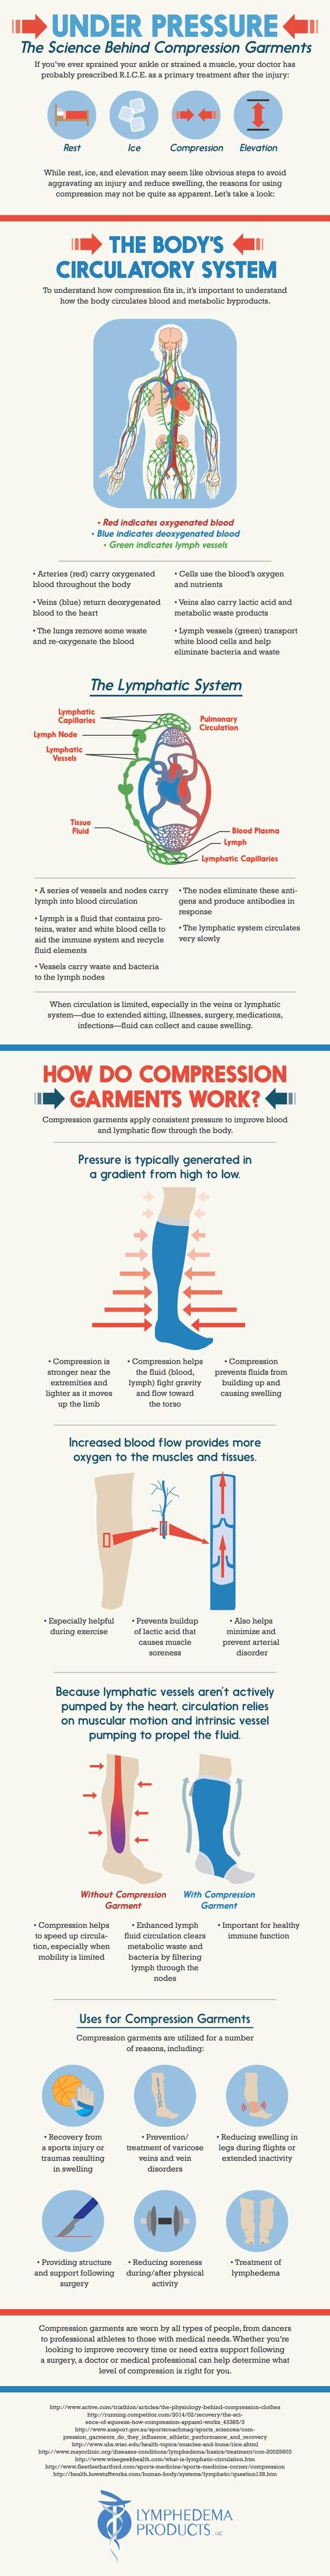 Under Pressure - The Science Behind Compression Garments